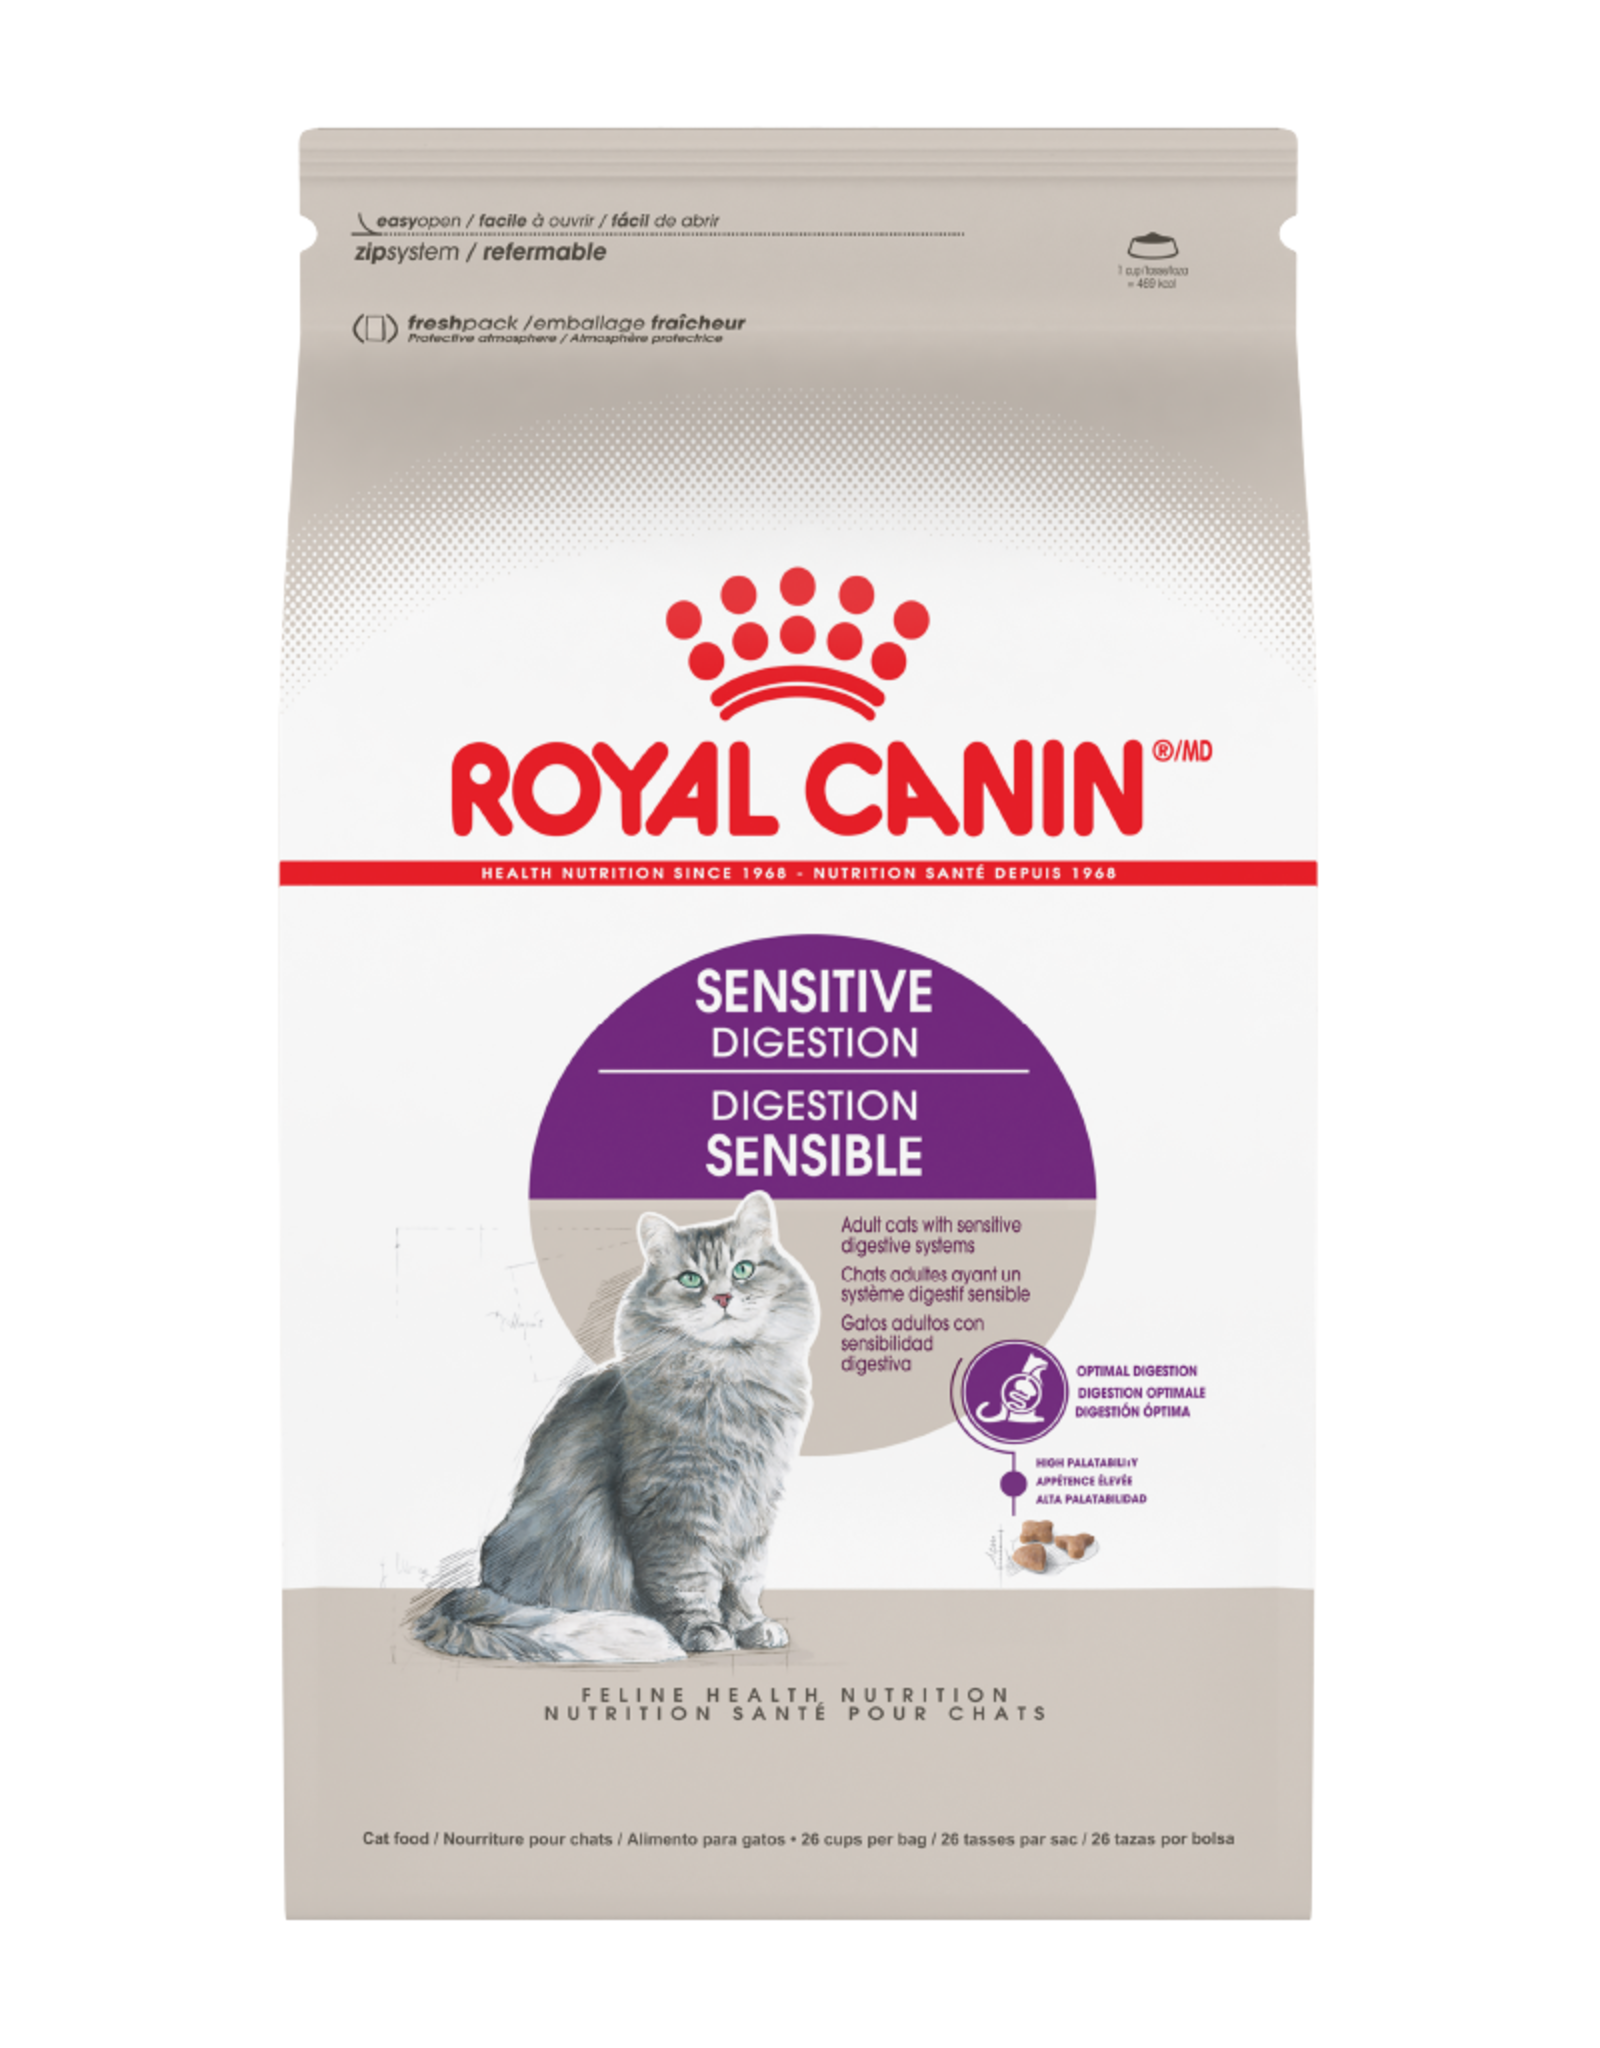 ROYAL CANIN Royal Canin | Feline Sensitive Digestion 3.5 lb